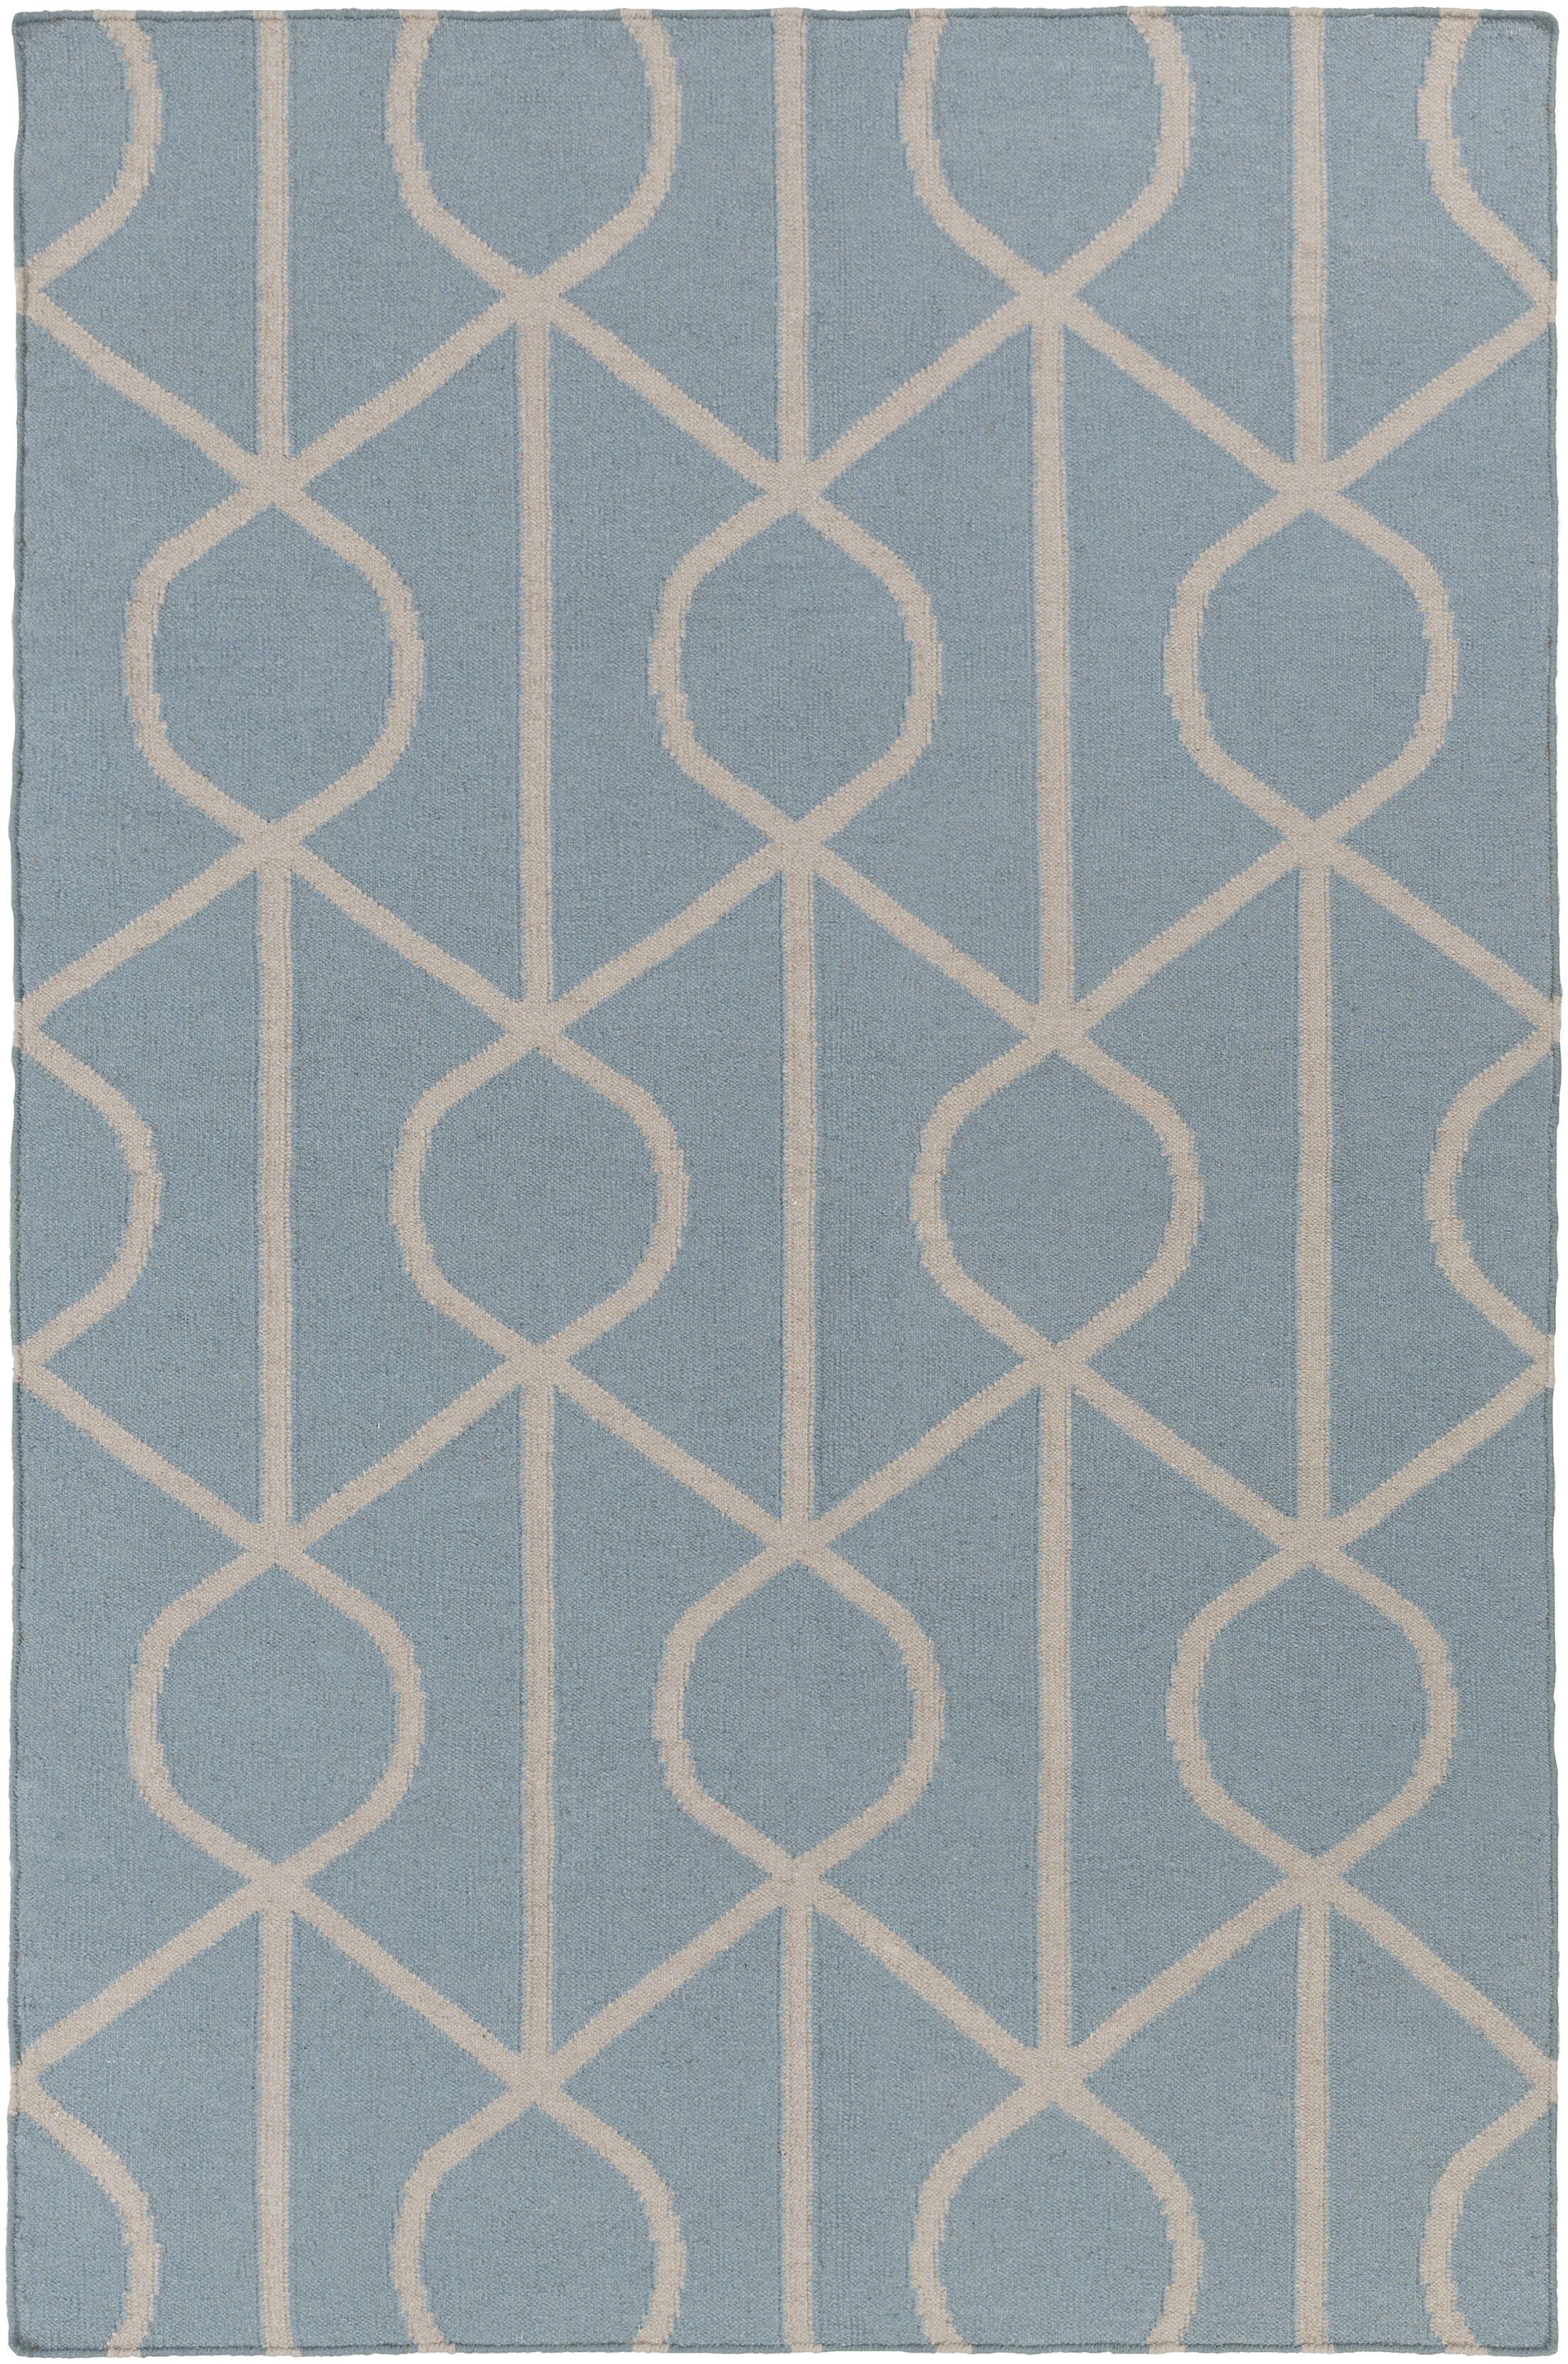 Murrill Light Blue Area Rug Rug Size: Rectangle 10' x 14'